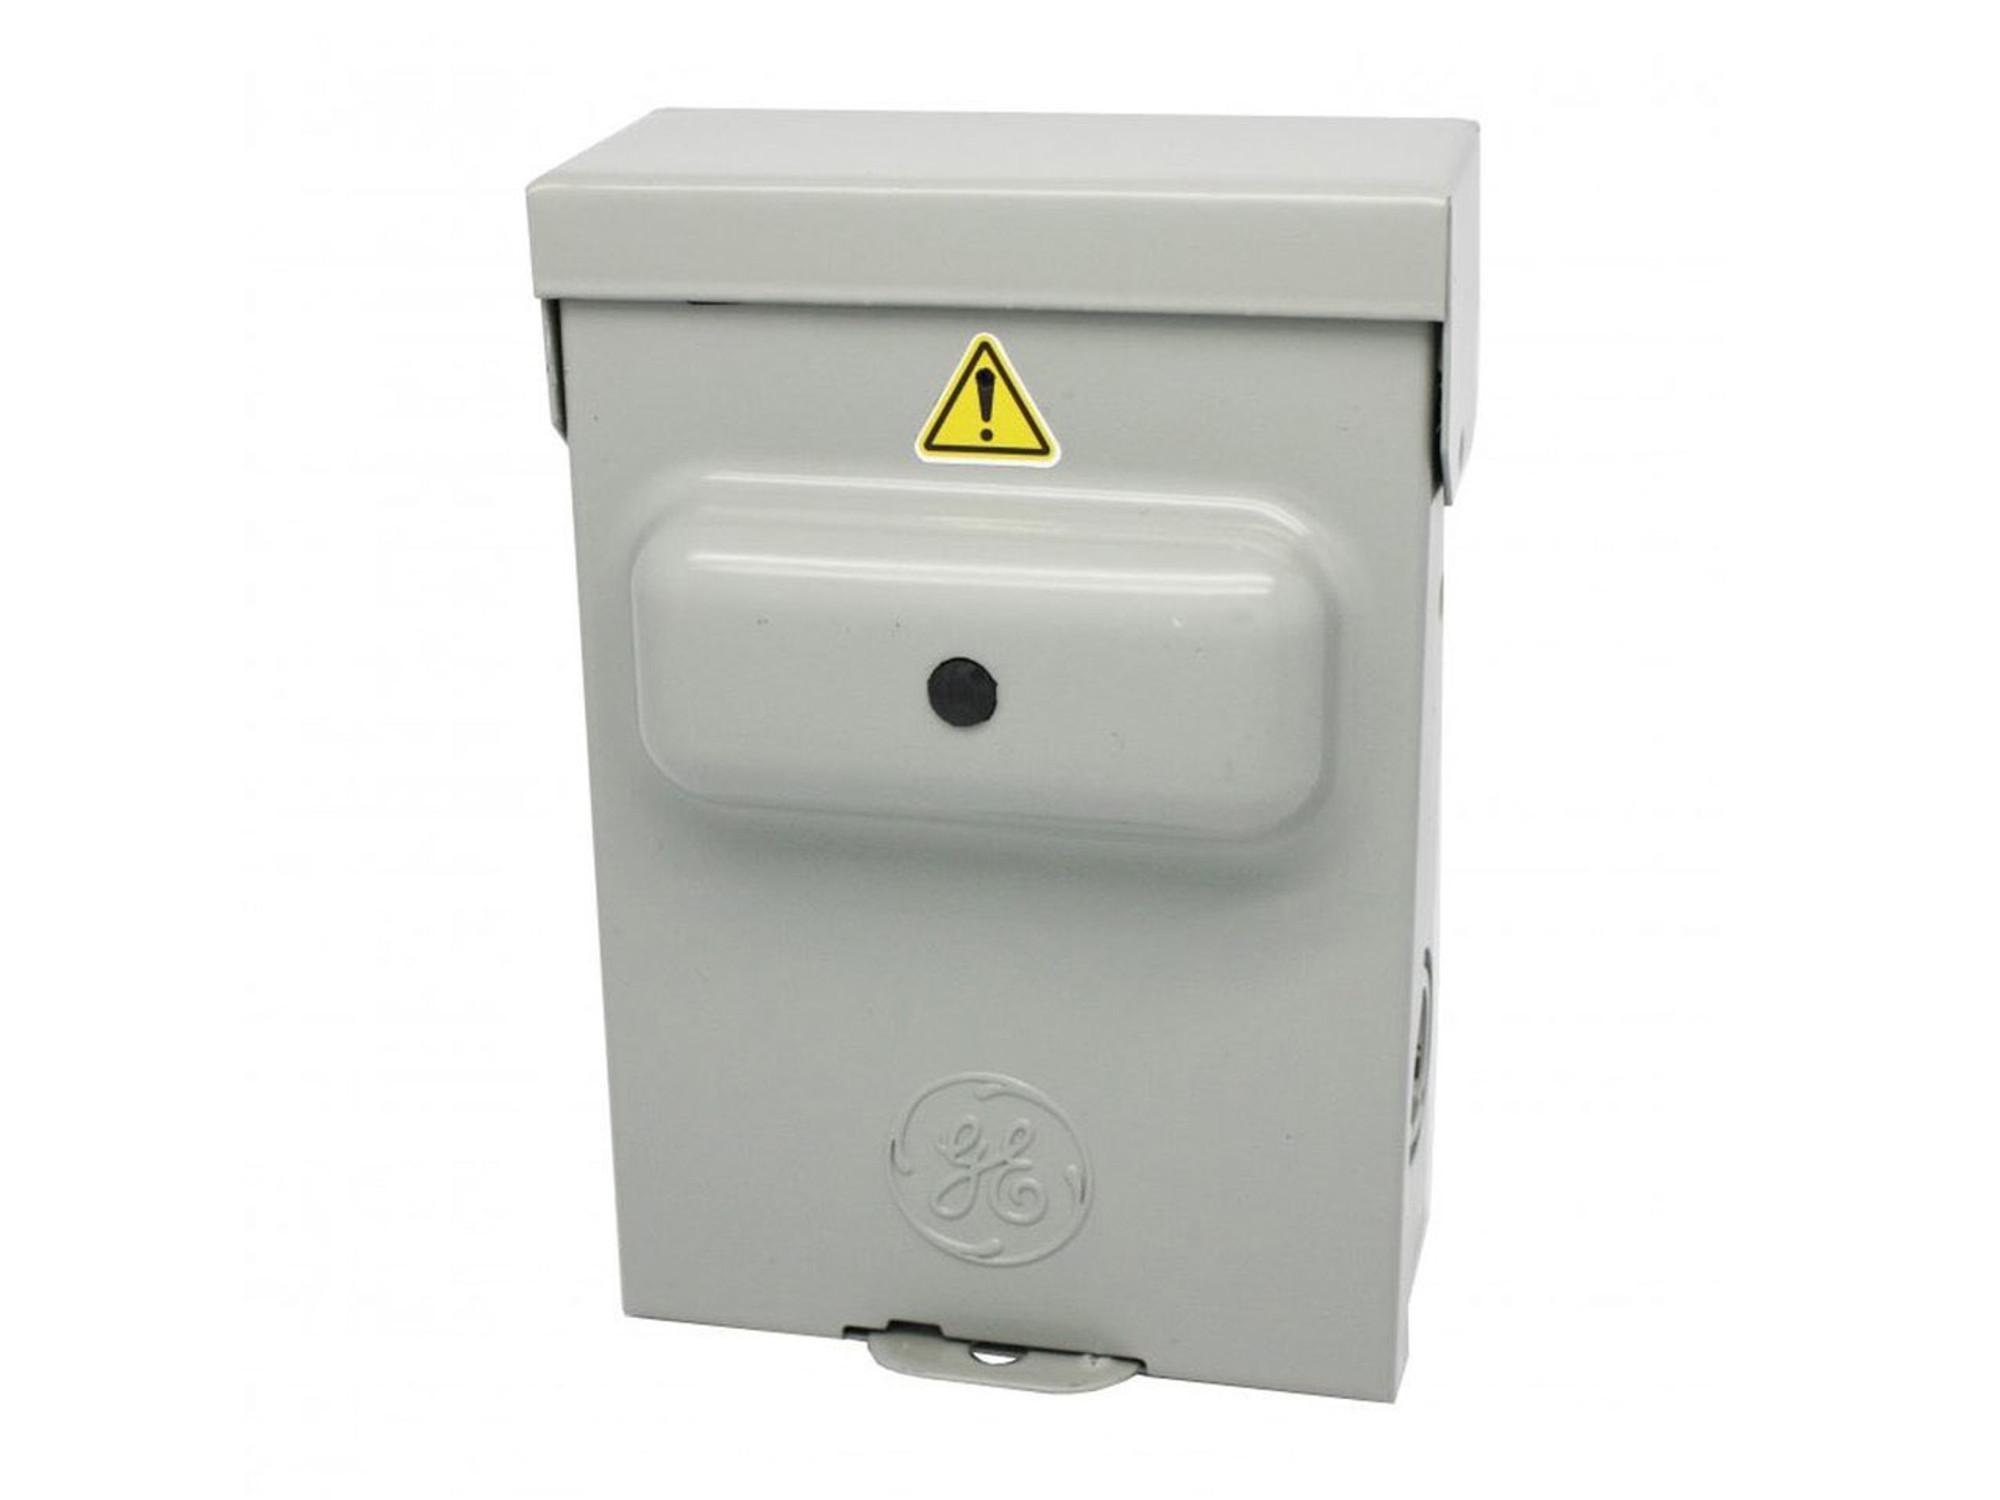 Electrical Box Hidden Camera and DVR   BrickHouse Security